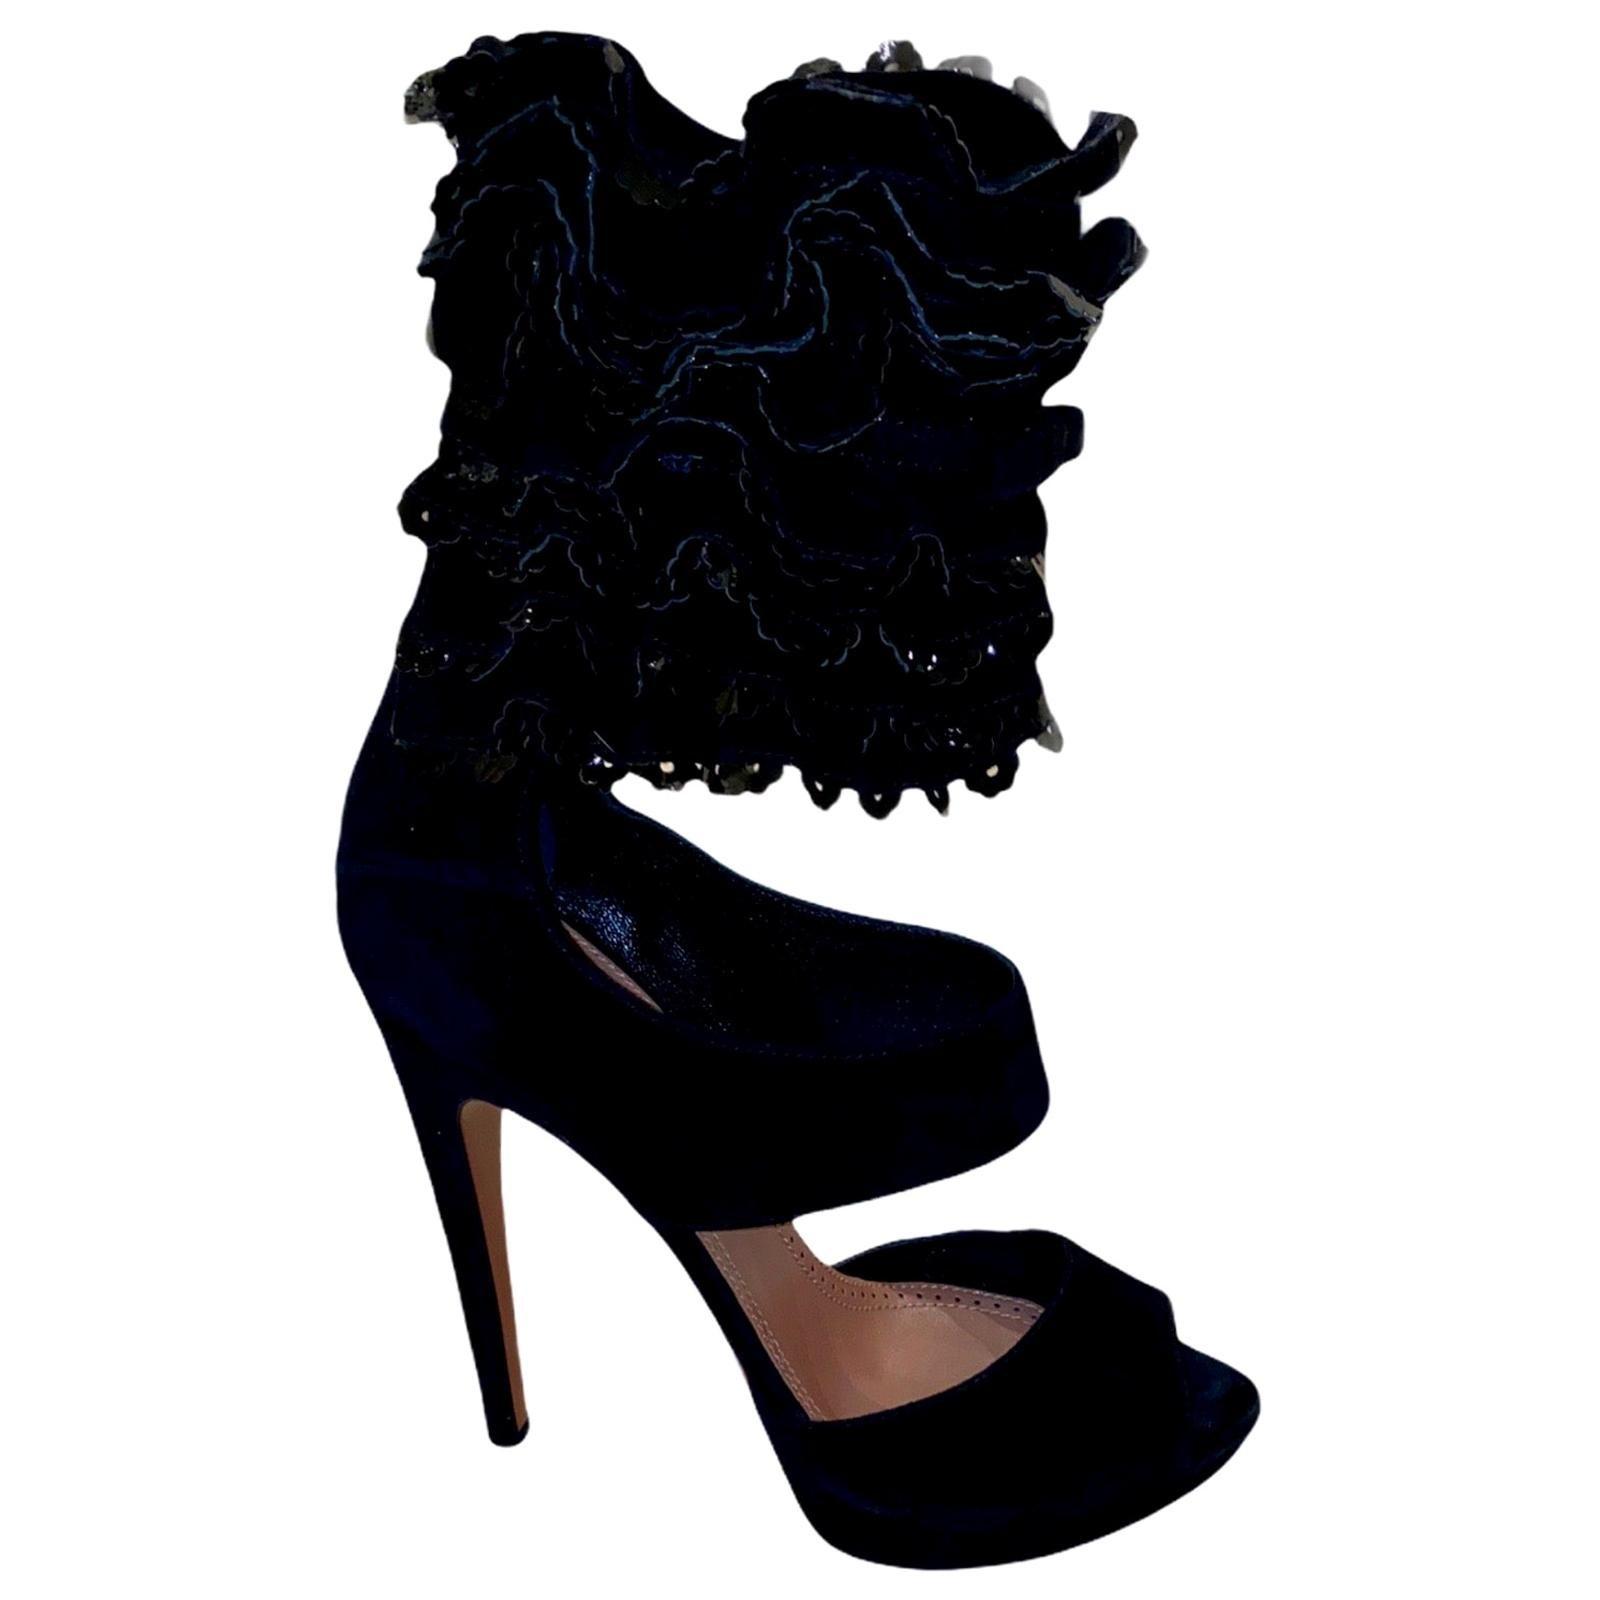 UNWORN Alaia Black Suede Ruffle Platform Ankle Sandals High Heels